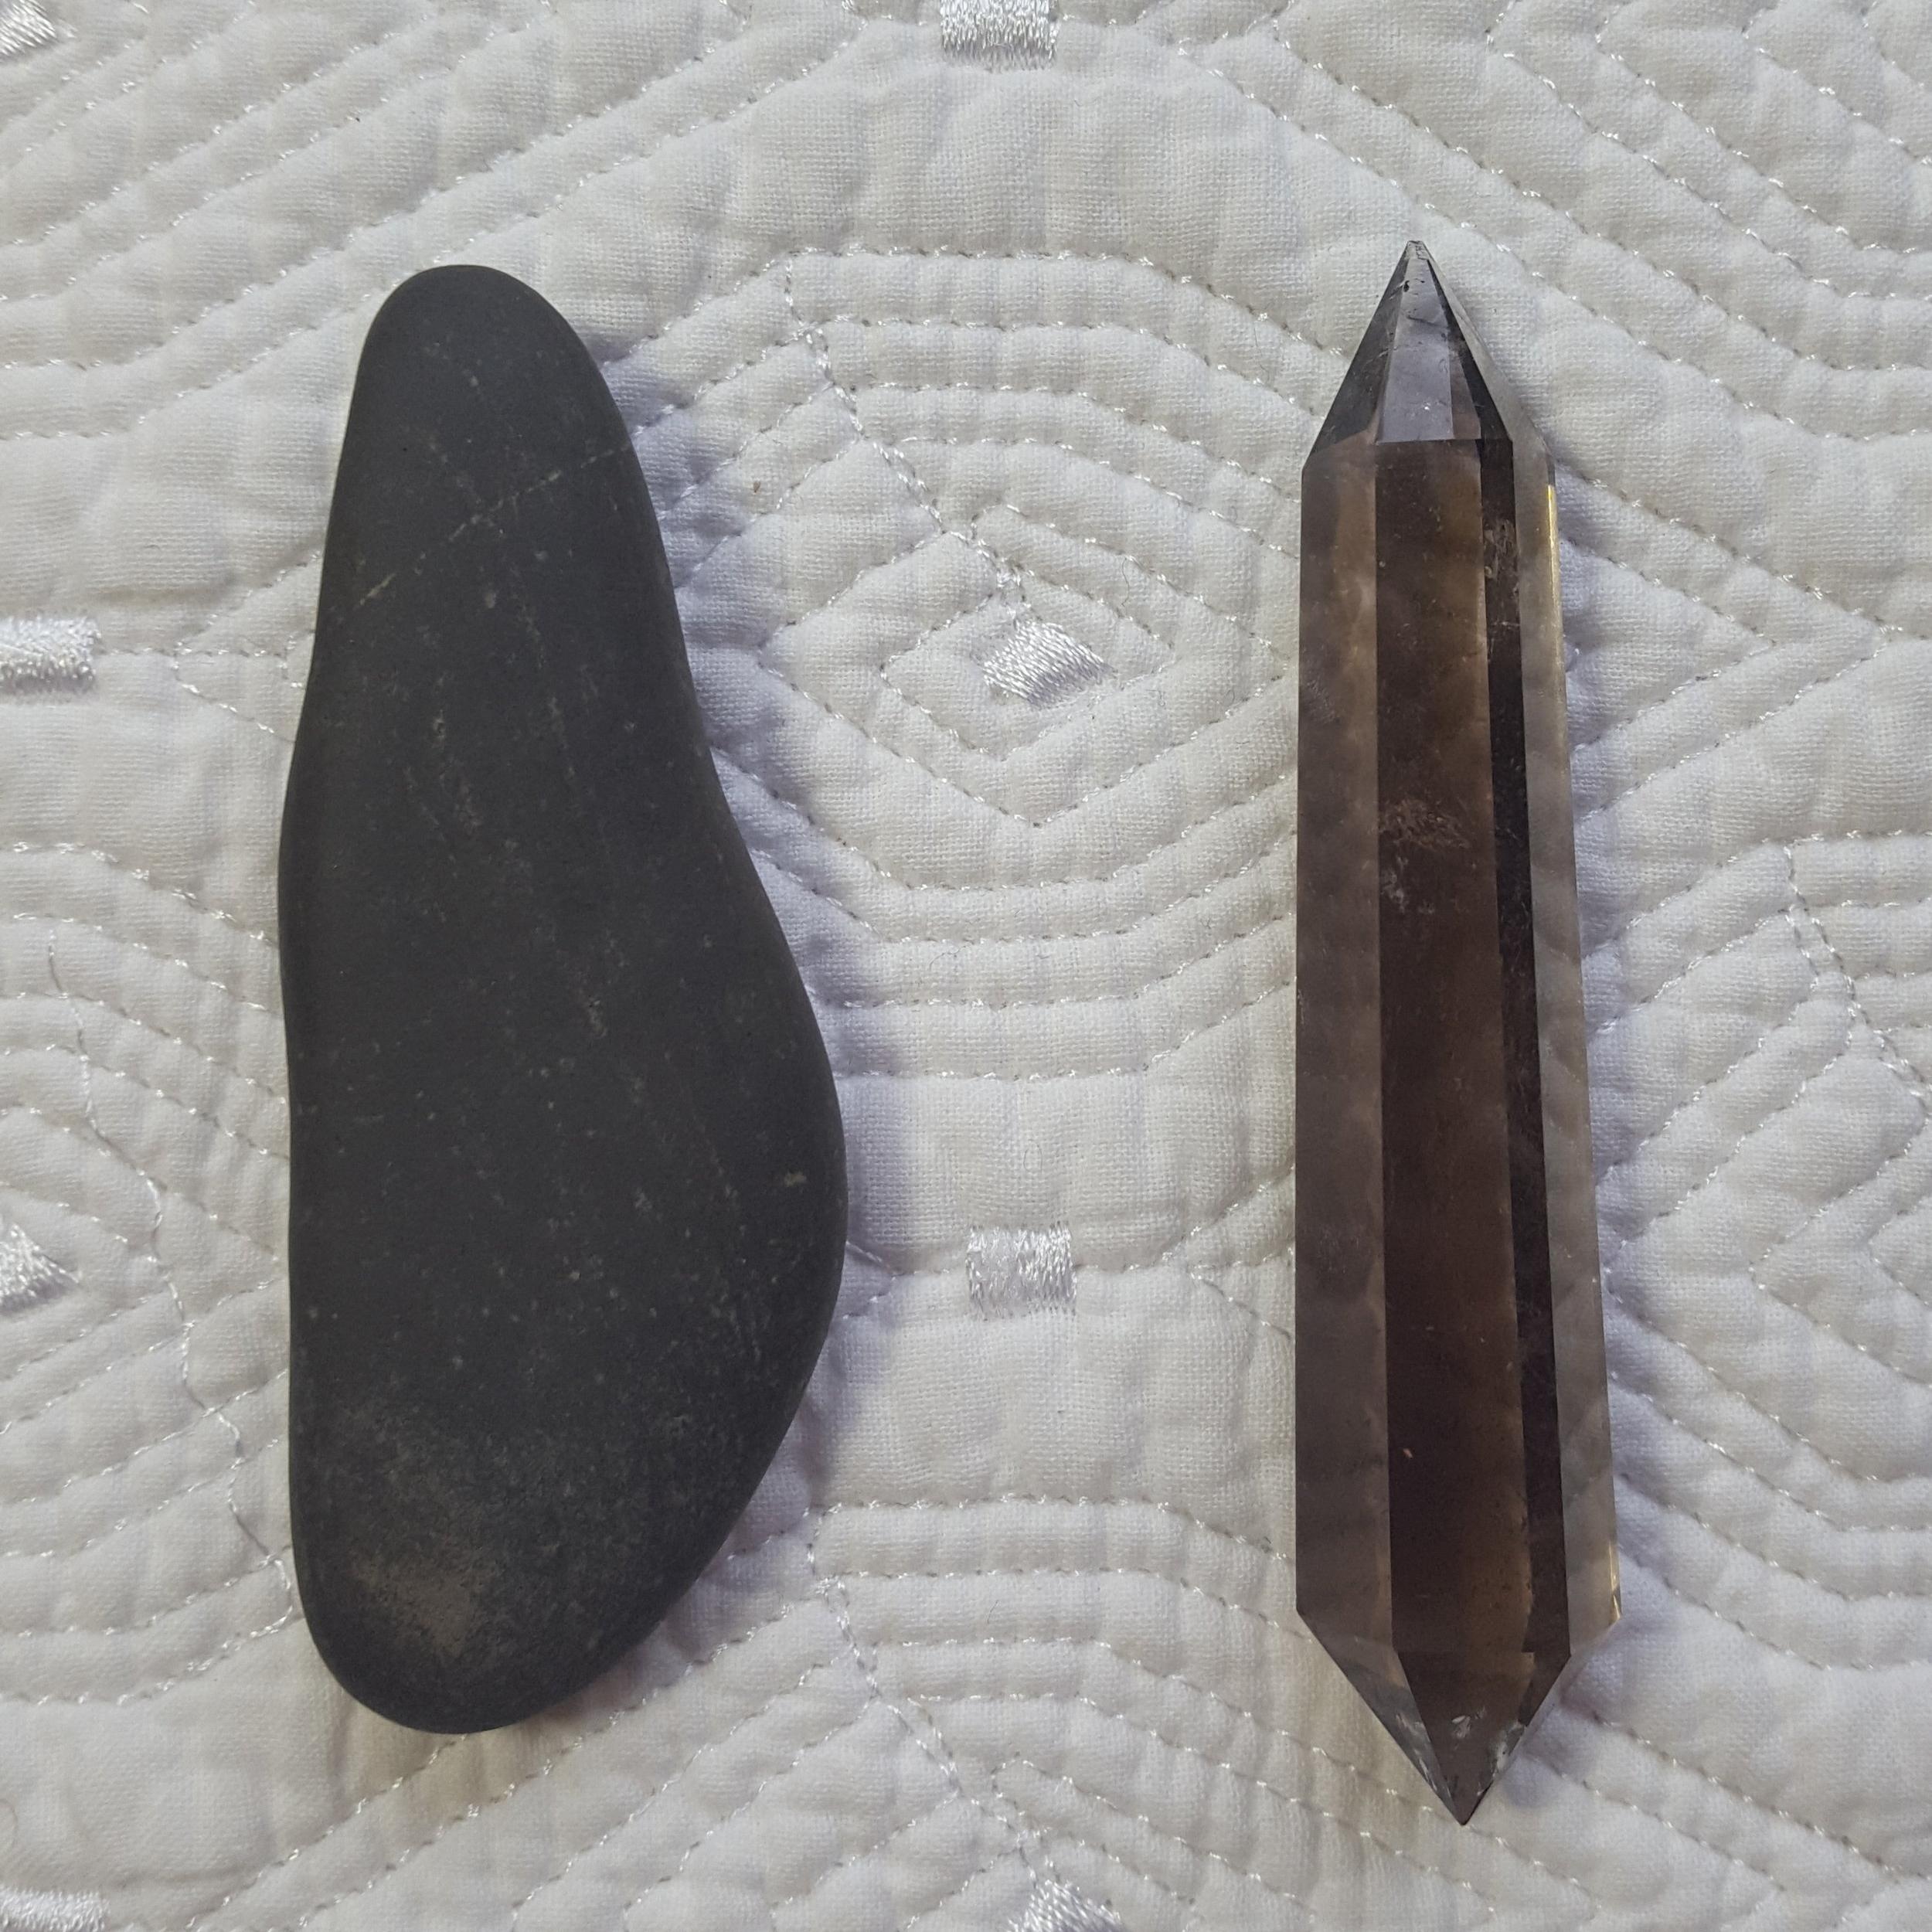 Precision Healing Tools, Alaskan Khuya and Smoky Quartz